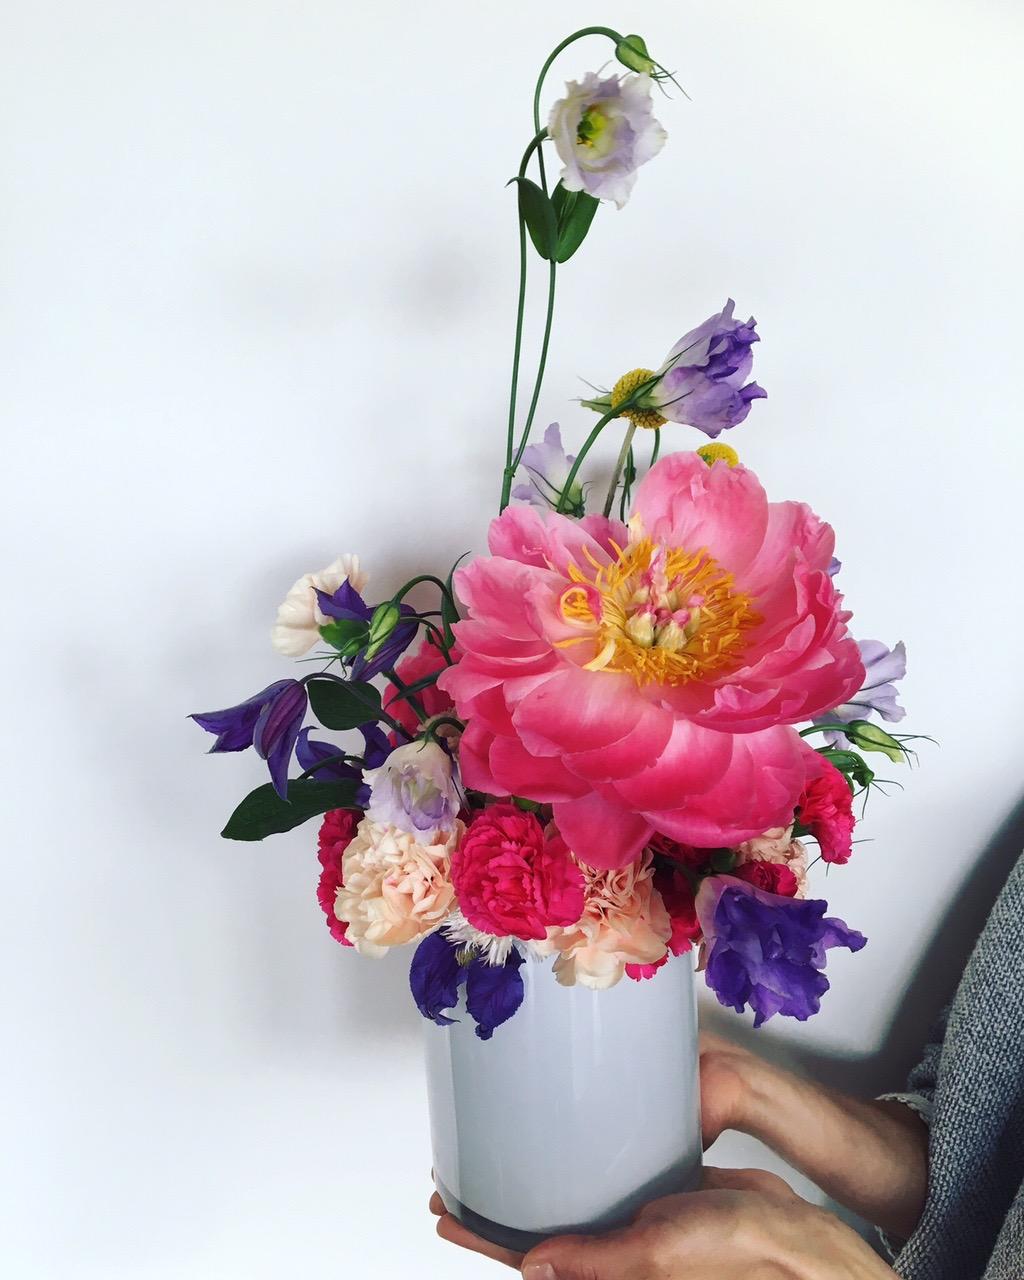 Sample Iris & Virgil floral design